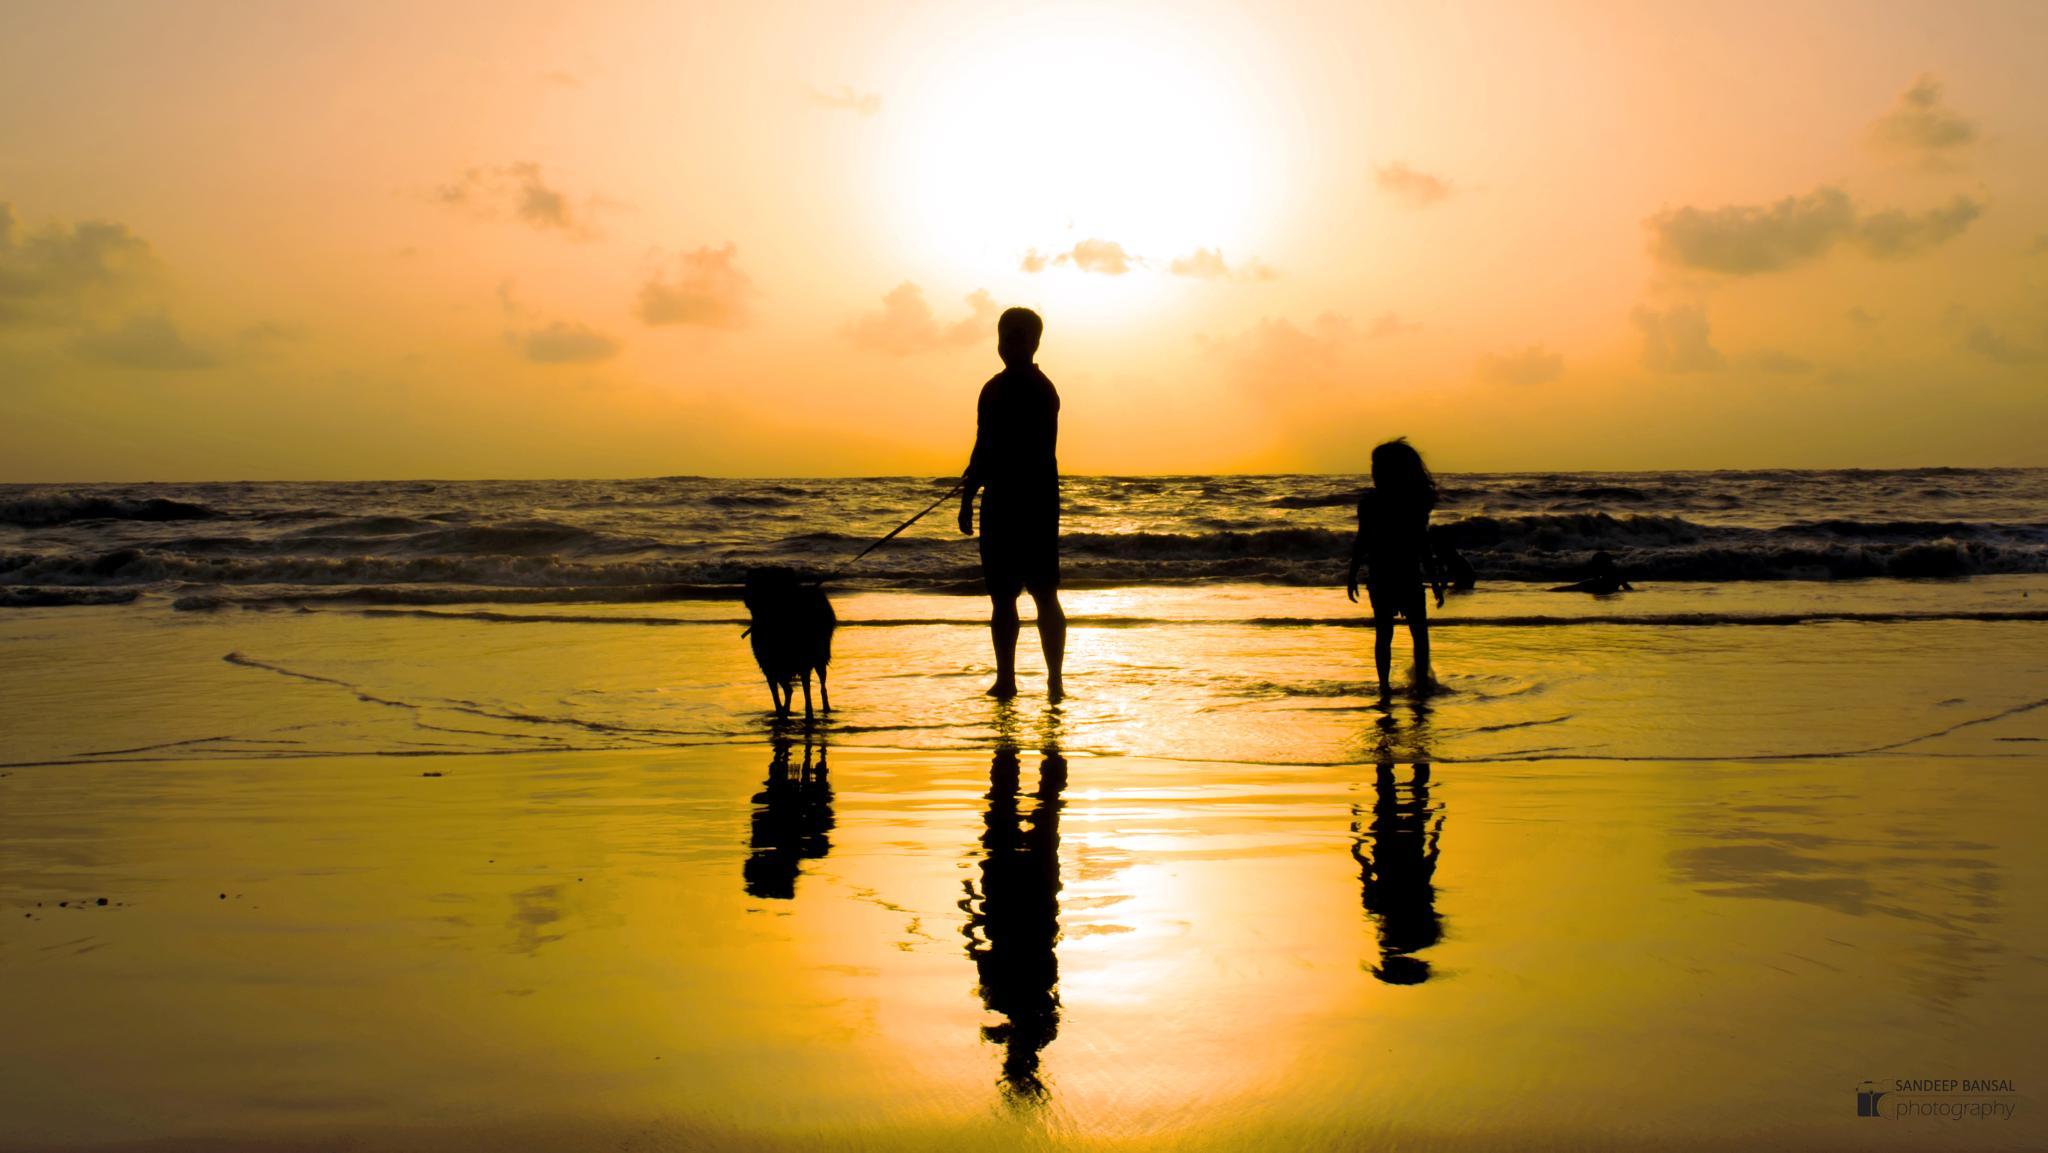 C off to Sun by SandeepBansal